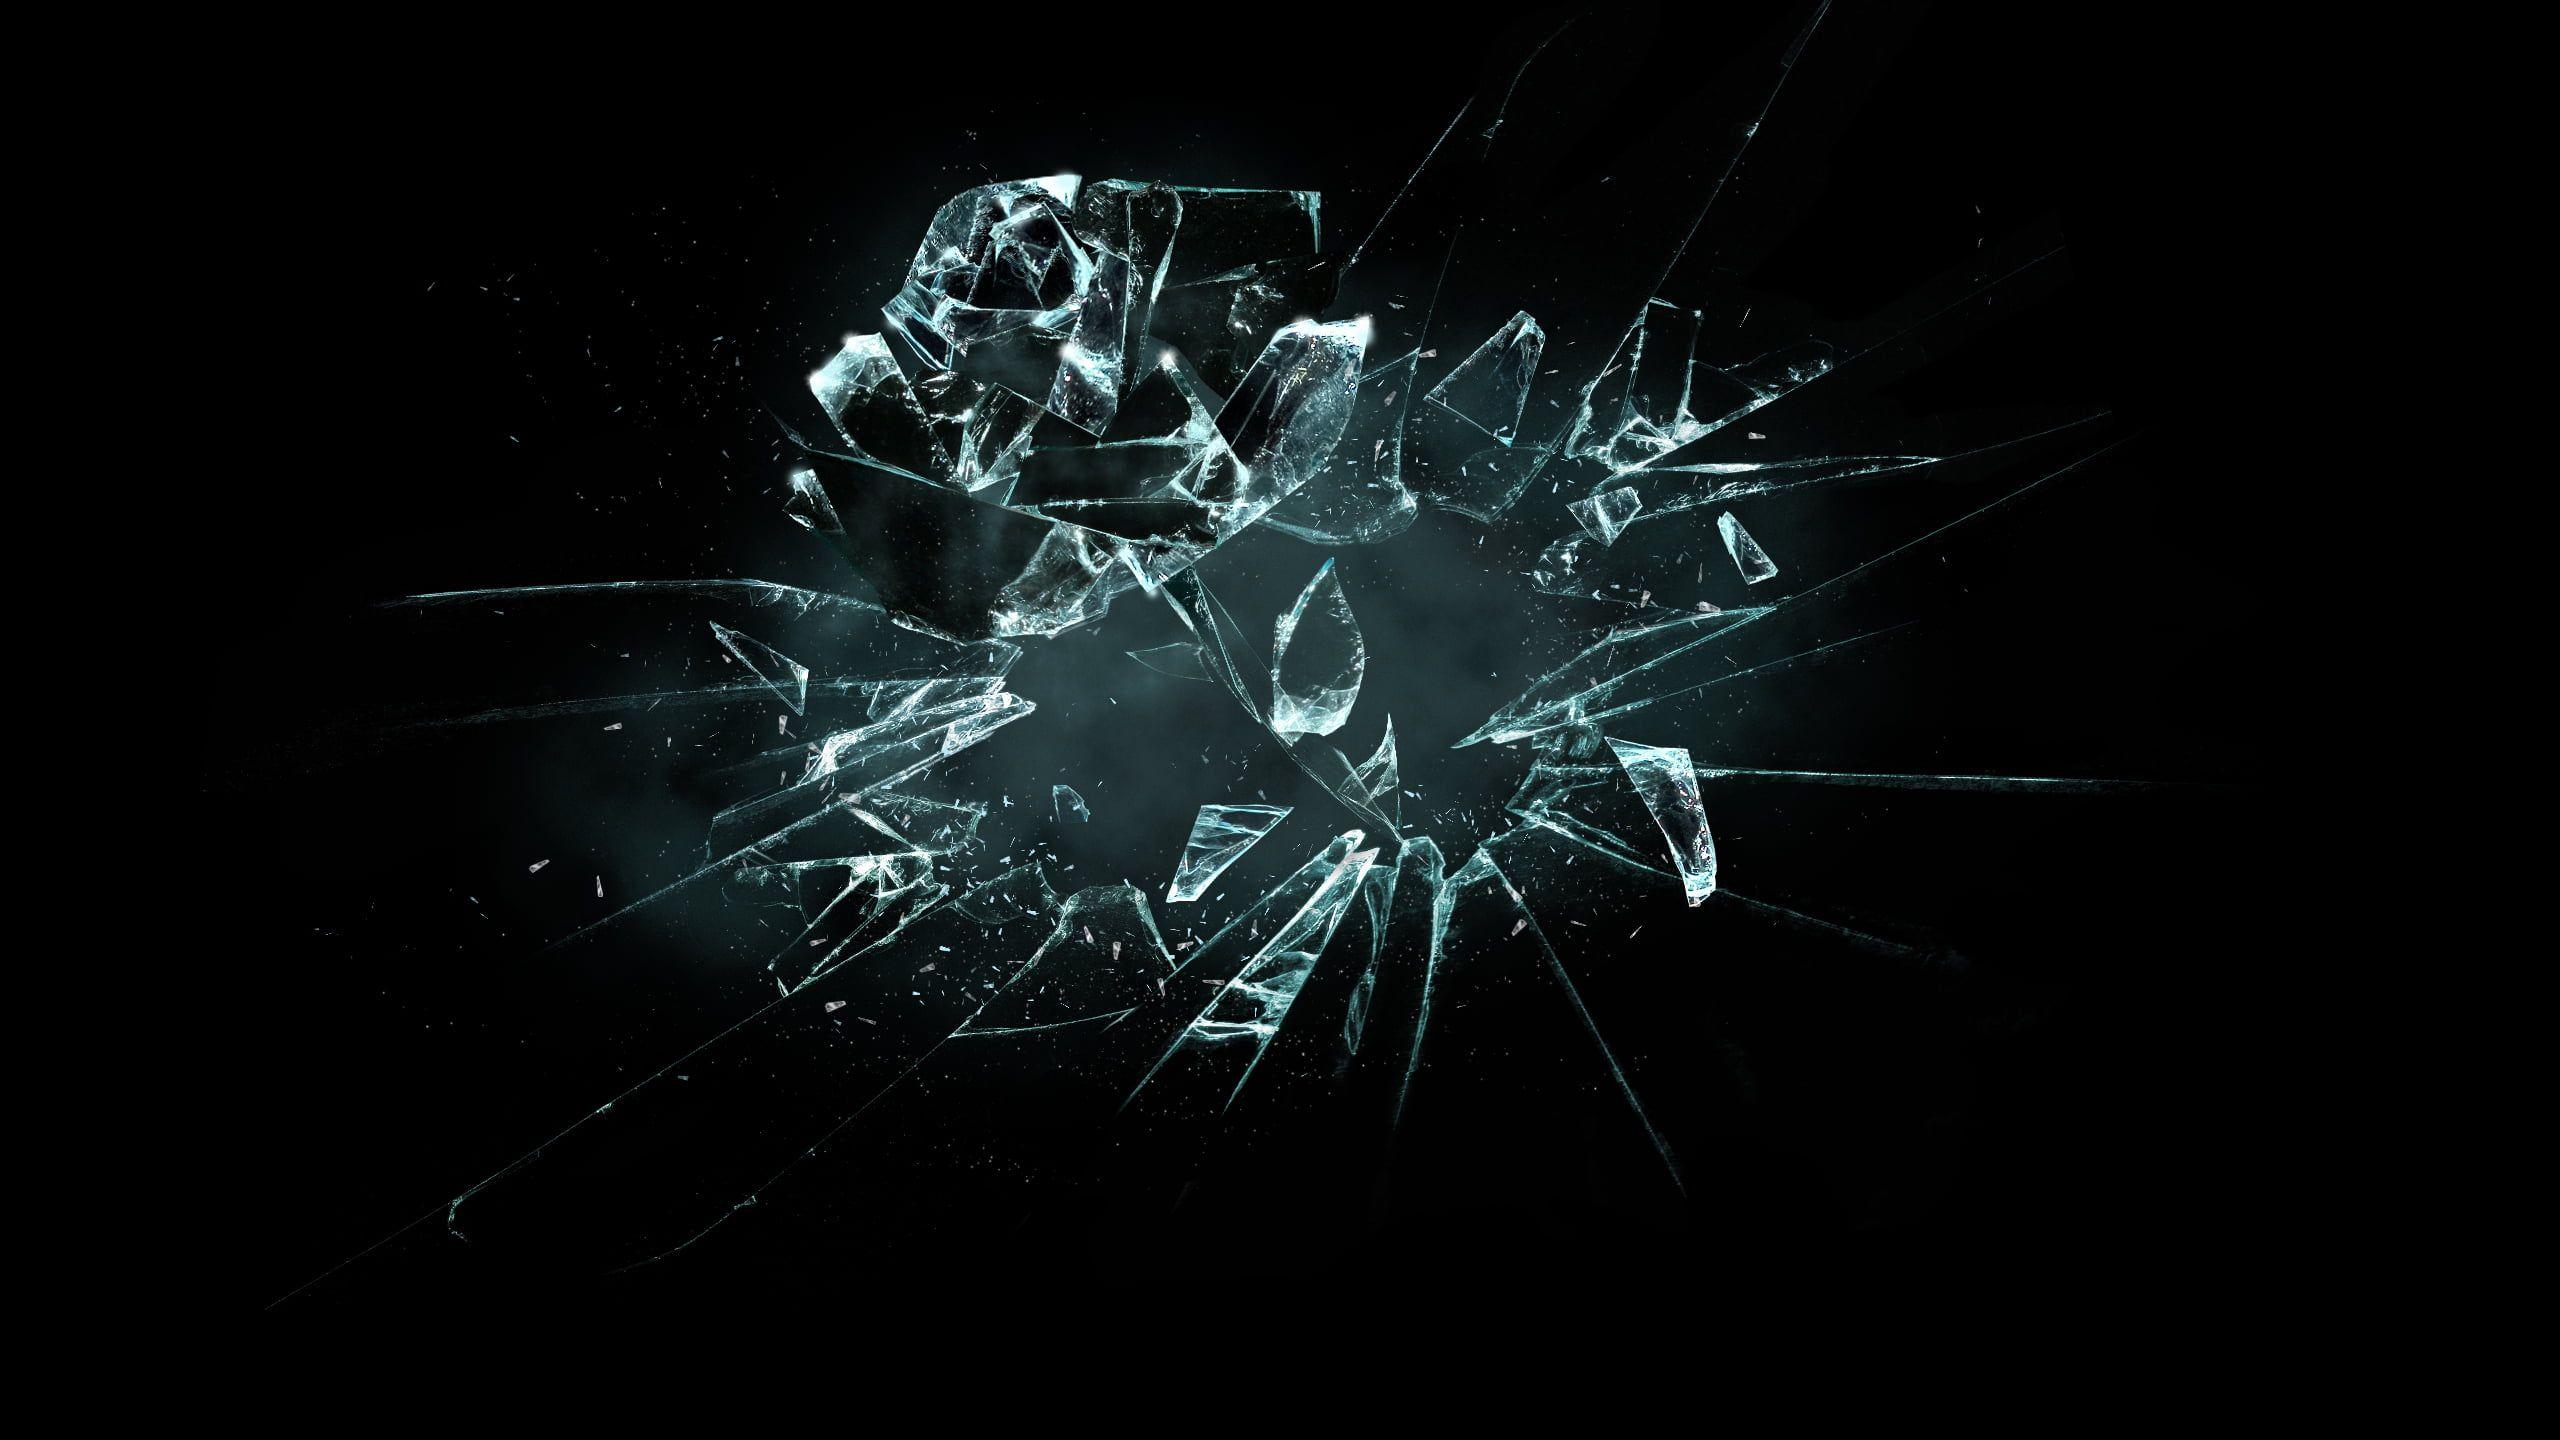 Broken Glass Wallpaper Rose Broken Flower Shards Of Glass The Broken Flower 2k Wallpaper Hdwallpa Broken Glass Wallpaper Screen Wallpaper Graphic Wallpaper